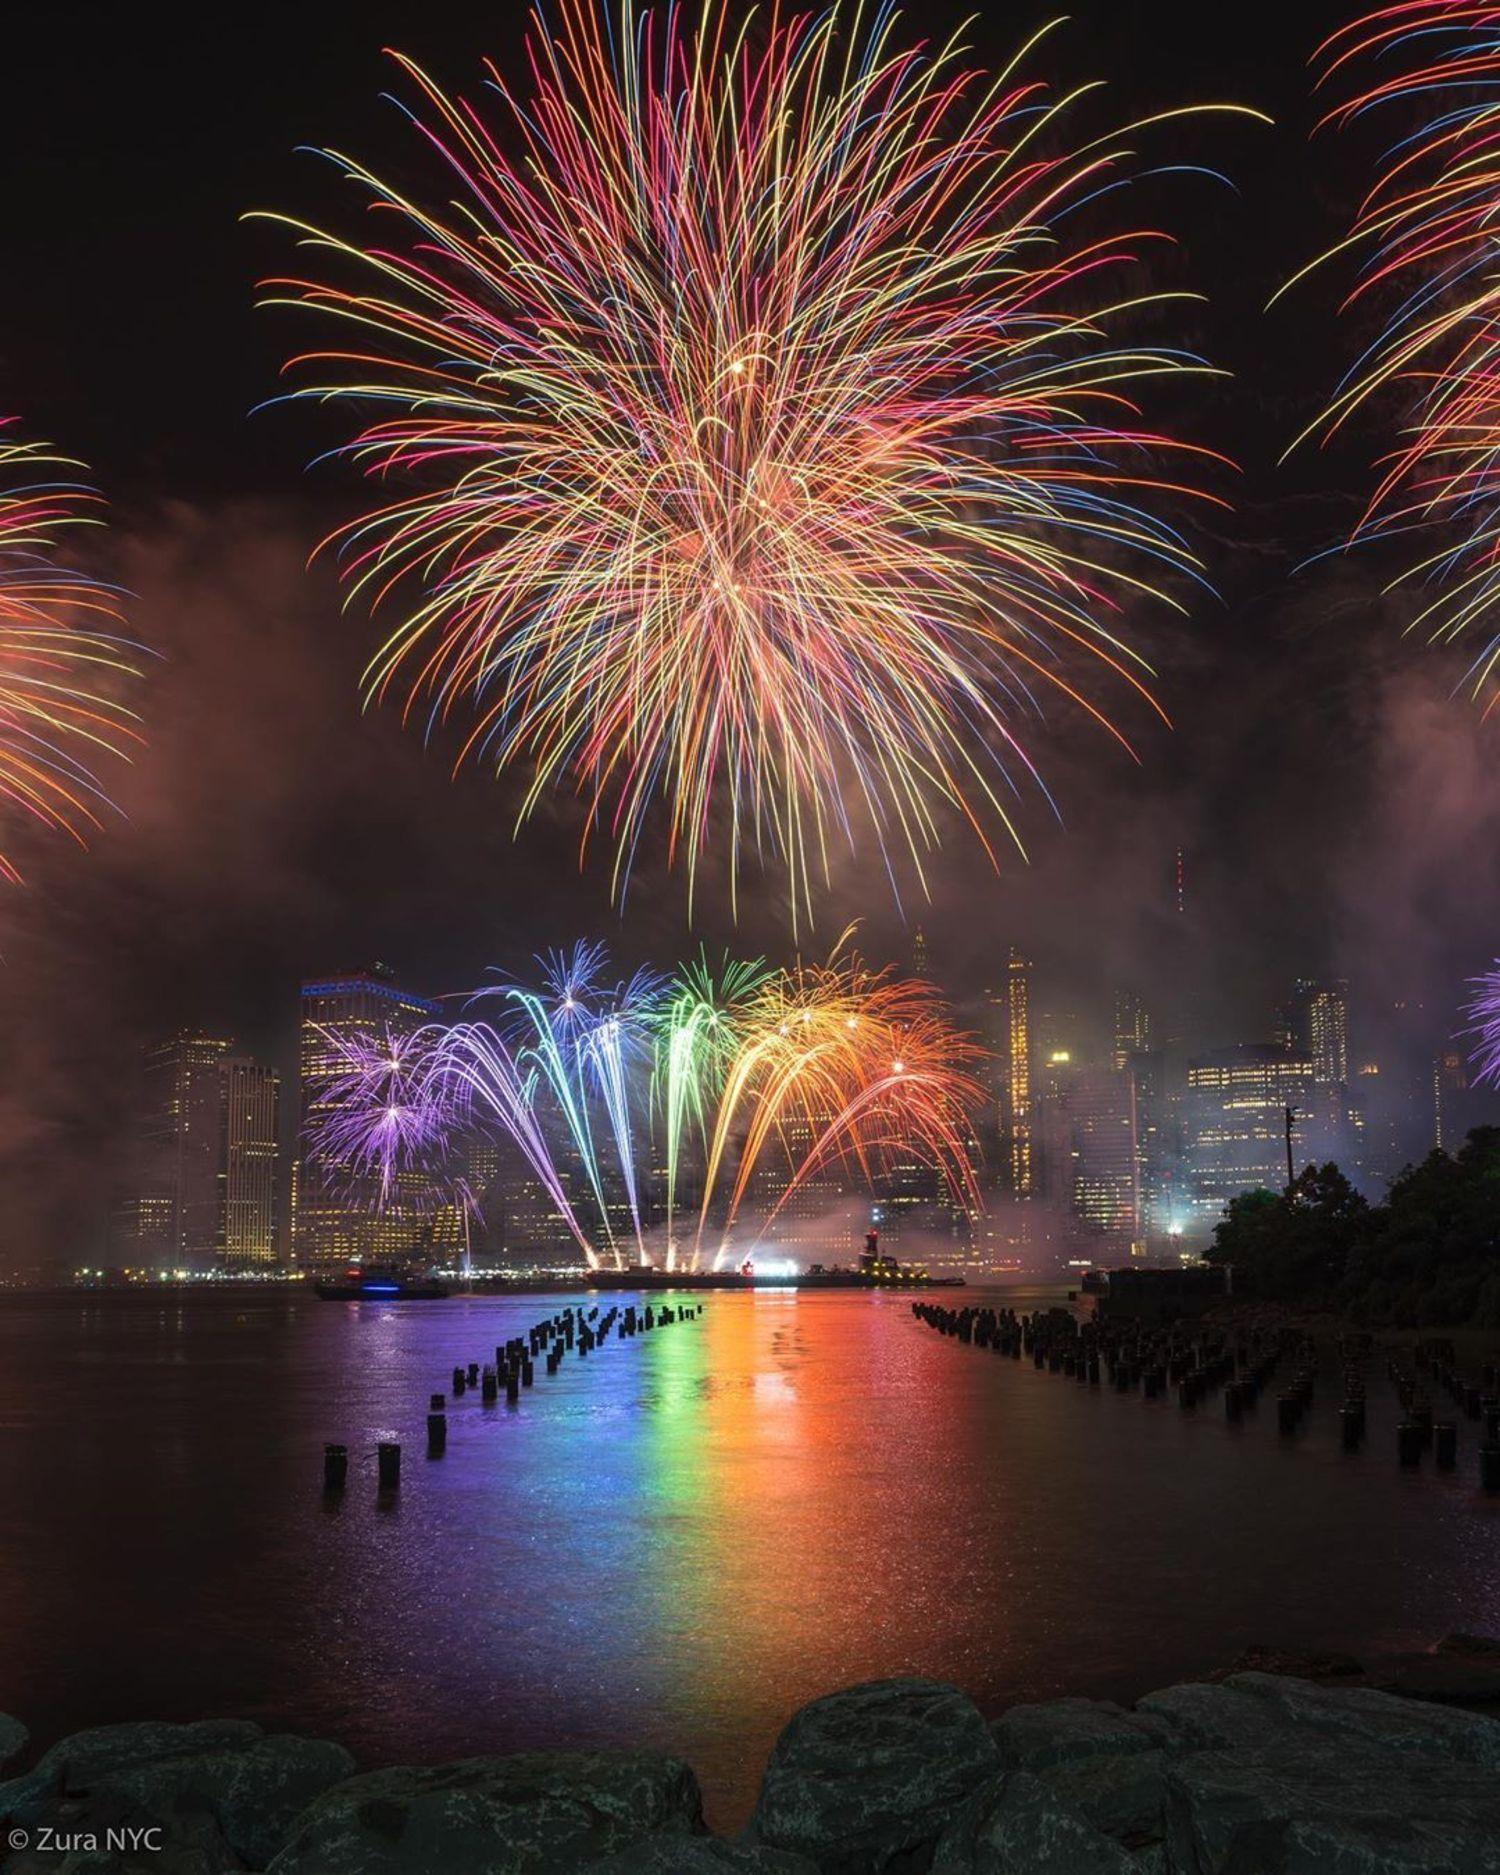 Independence Day 2019 ! 🎆🎉🇺🇸 ******************************************************* My new account. 🔶@NewYork_feature  #zuranyc ******************************************************* @sonyalpha Sony A7RIII + Sony GM 12-24mm • • • ******************************************************** #sonyalpha  #newyorkcity  #loves_nyc #nycgo  #nypix  #travelnyc #nycprimeshot #ig_nycity #newyork_instagram #what_i_saw_in_nyc #newyork_ig #nyloveyou #nycityworld #iloveny #newyork_feature  #Picturesofnewyork #instagramnyc #lensbible  #topnewyorkphoto #beautifuldestinations #icapture_nyc  #nycprime_ladies #ignyc #nycdotgram #nycstreets #nycity #newyorkgram #newyorkcitylife #nycviews